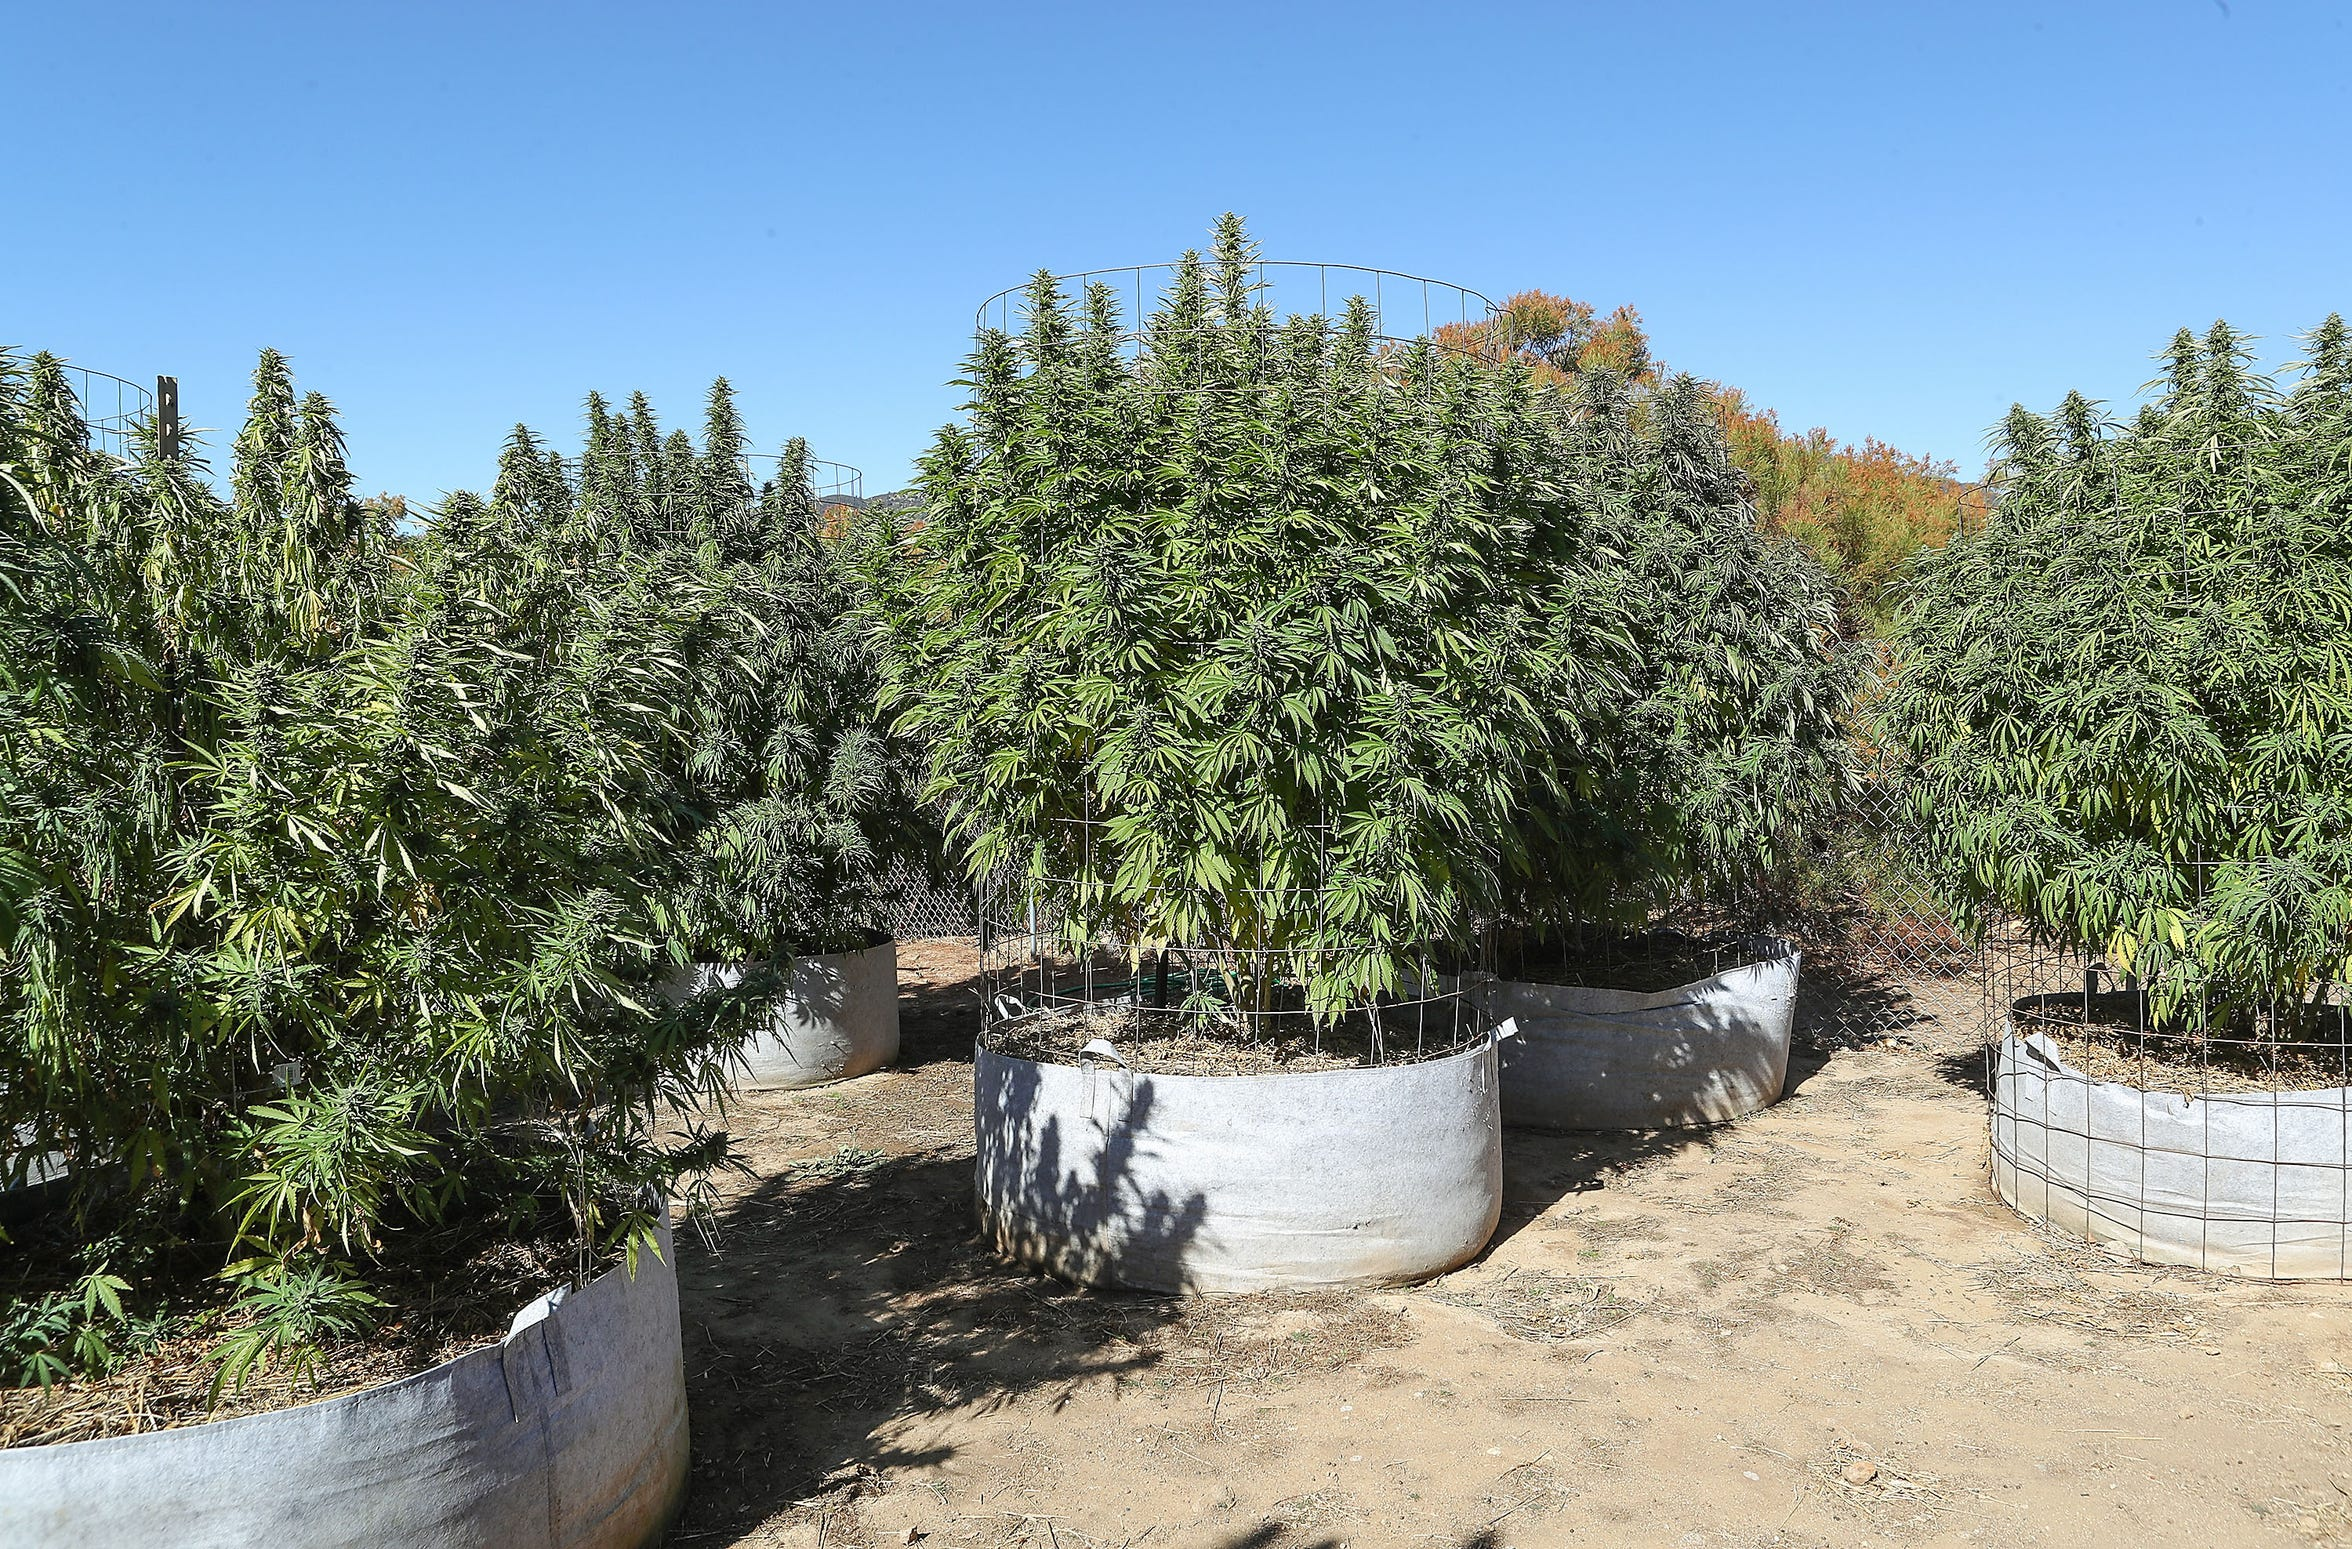 Cannabis plants grow at a pot farm in Anza, Calif., October 3, 2019.